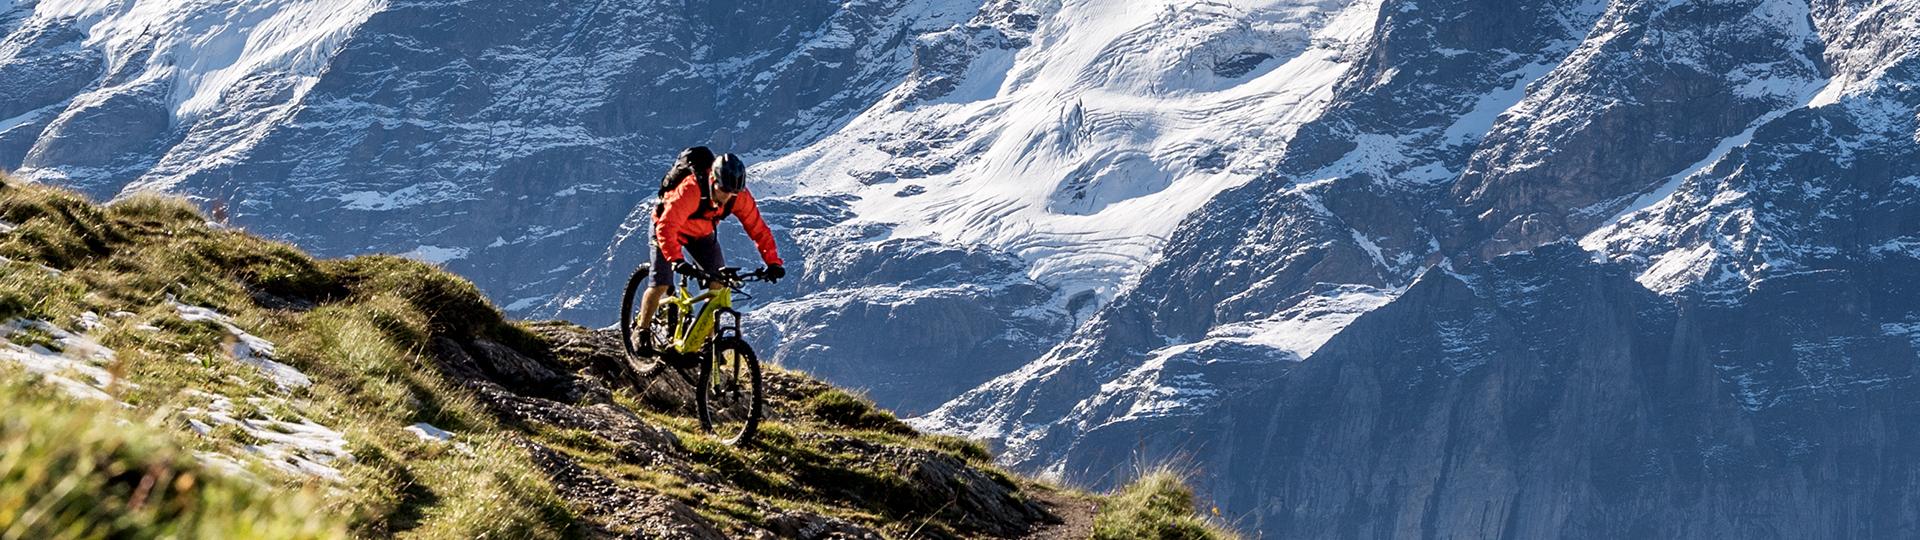 mit e-mountainbikes in die neue Saison